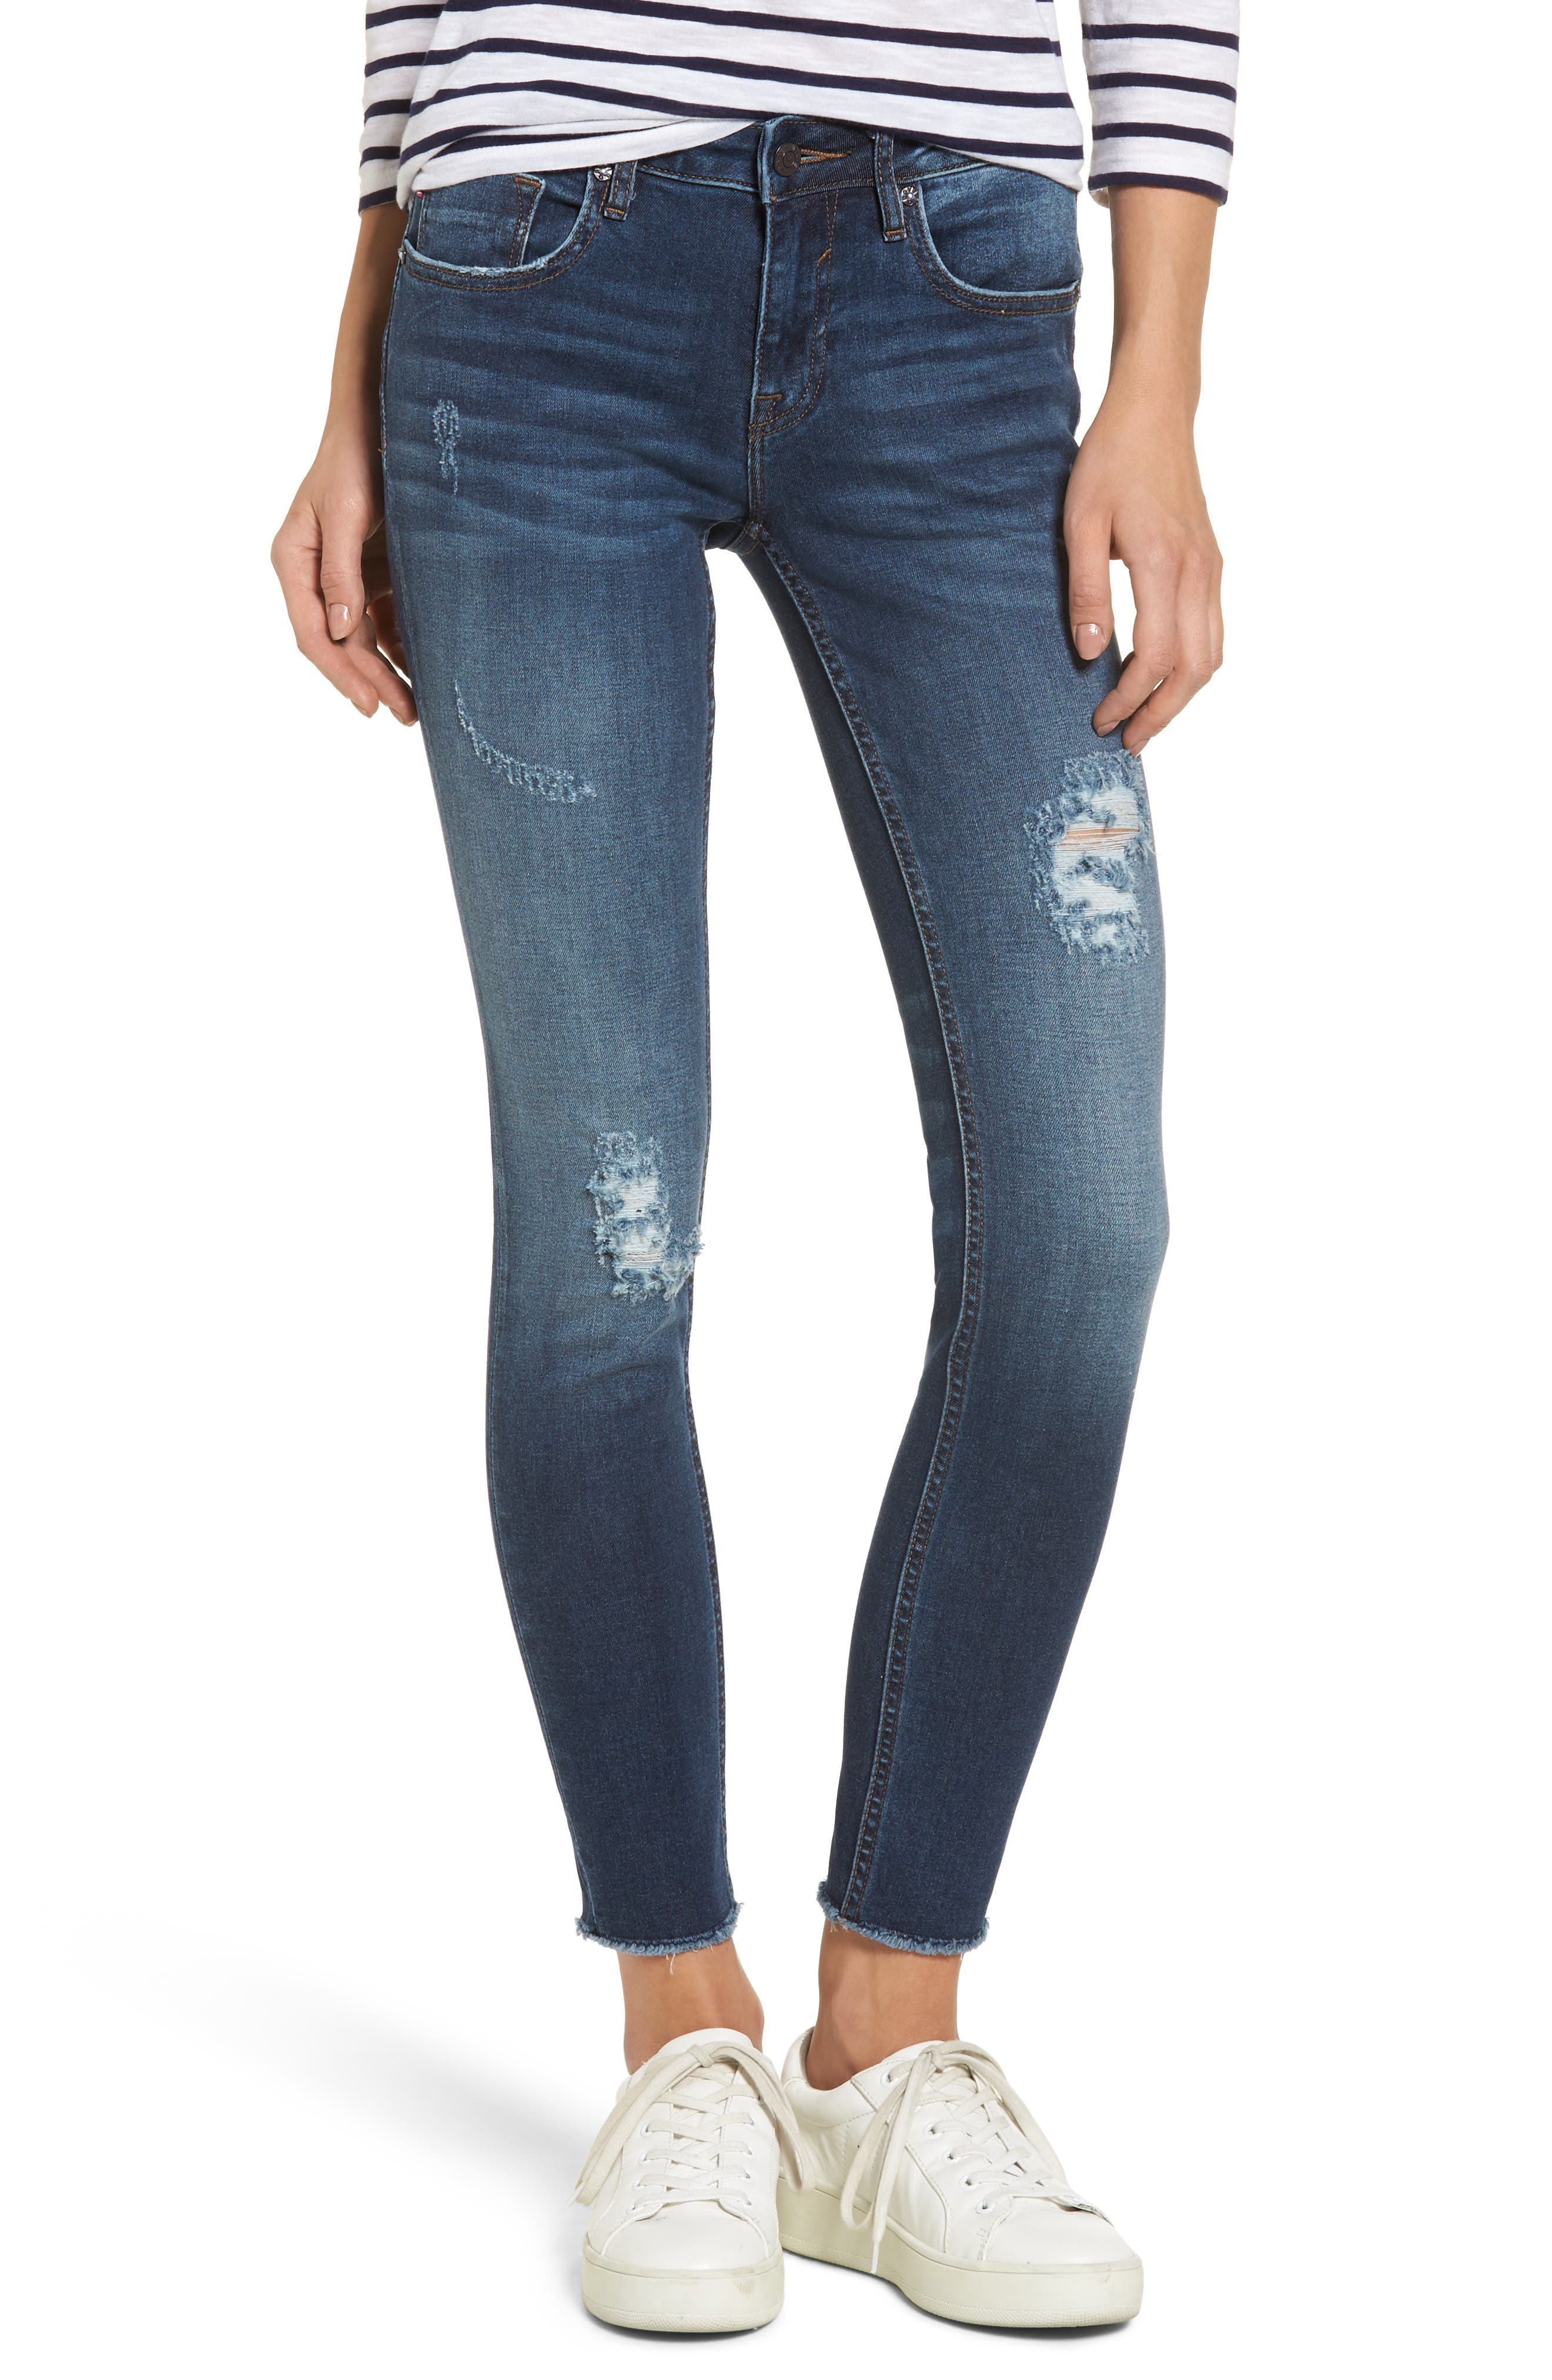 Alternate Image 1 Selected - Vigoss Jagger Distressed Skinny Jeans